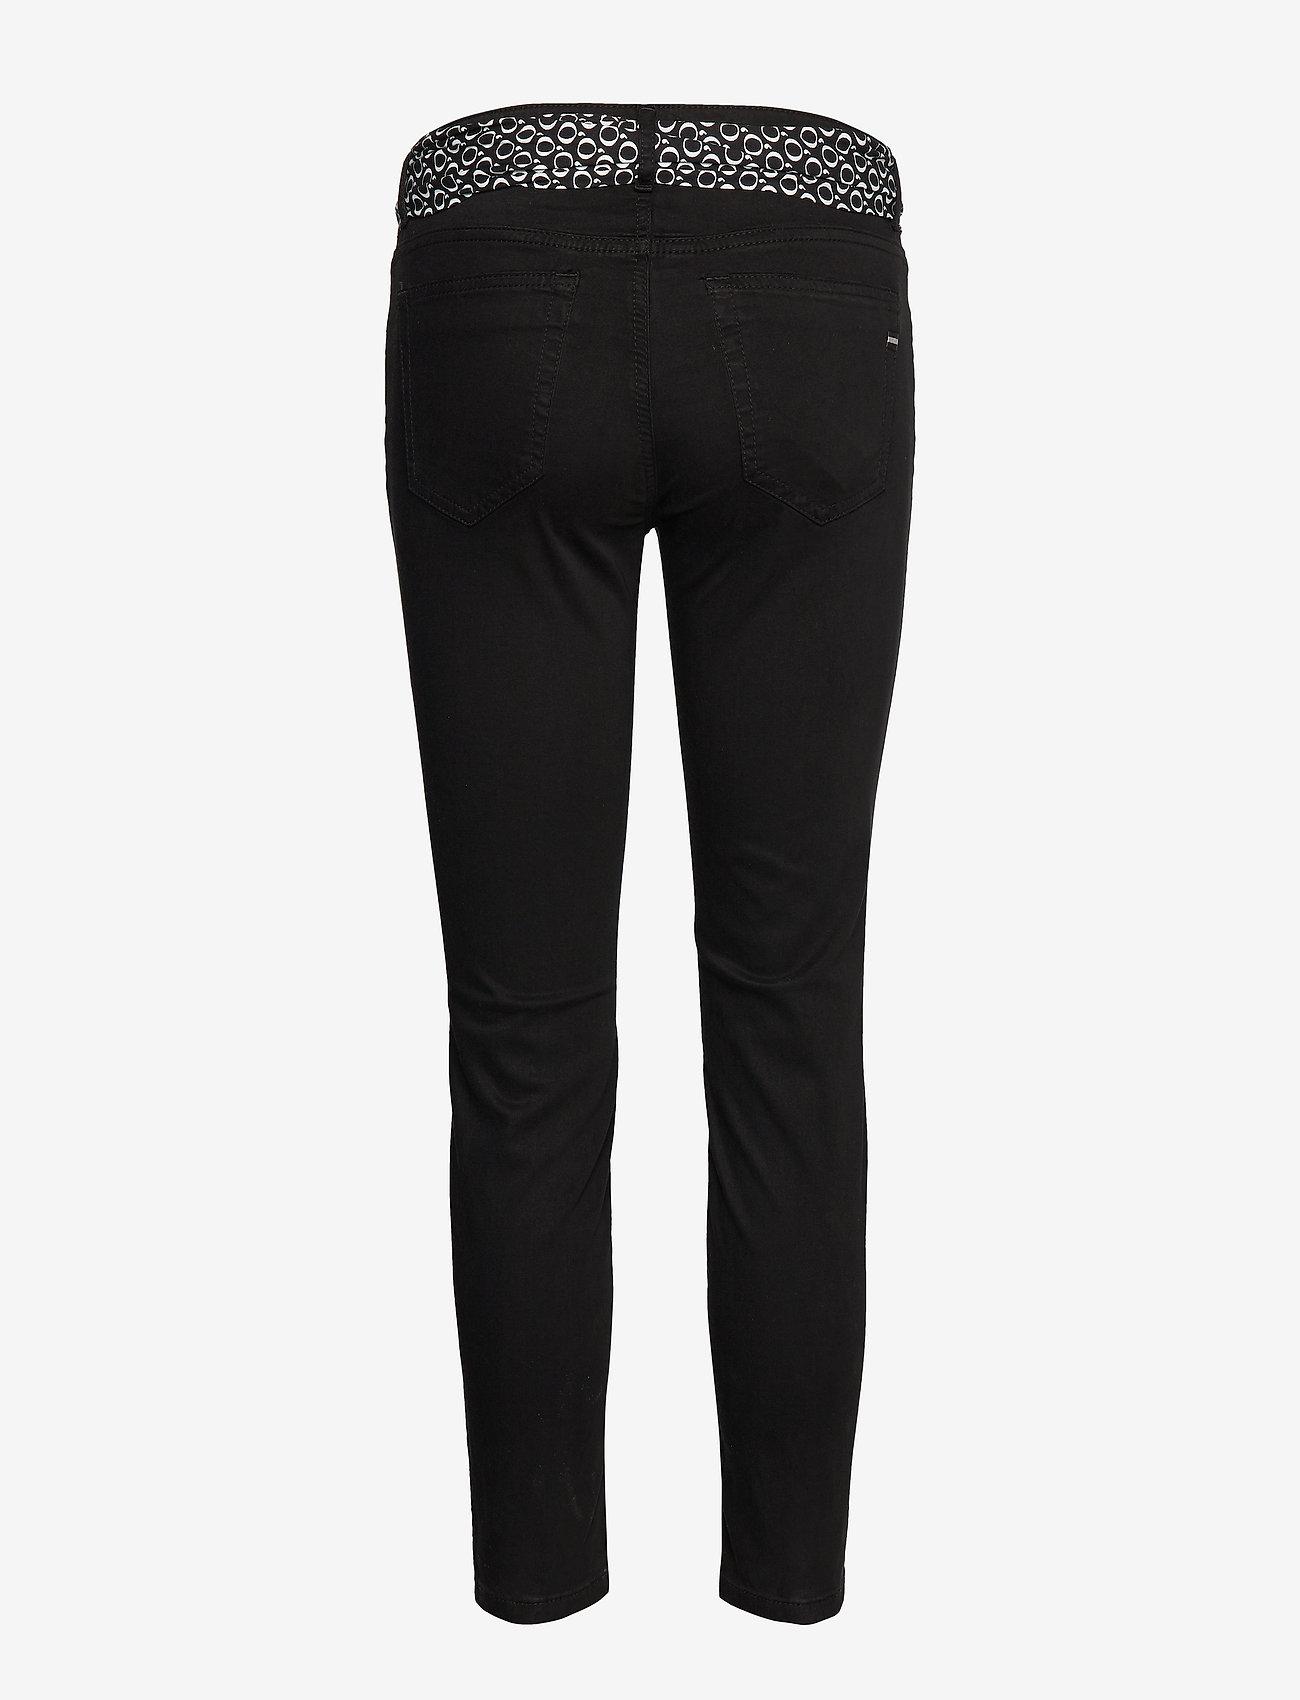 Marc O'Polo - Jeans - slim jeans - black - 1